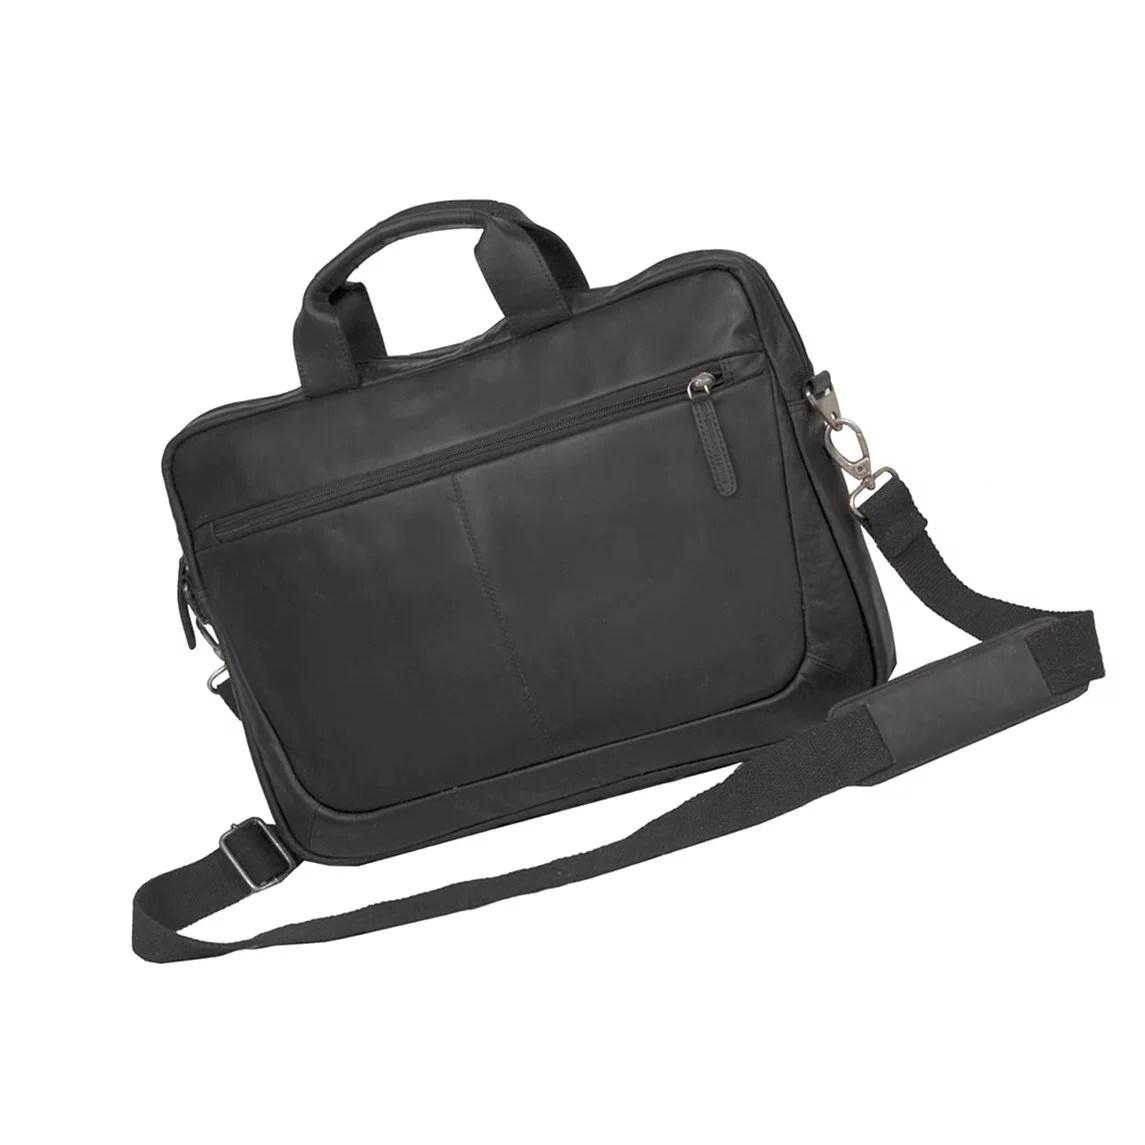 Genuine Leather Fancy Black Laptop Bag For Office